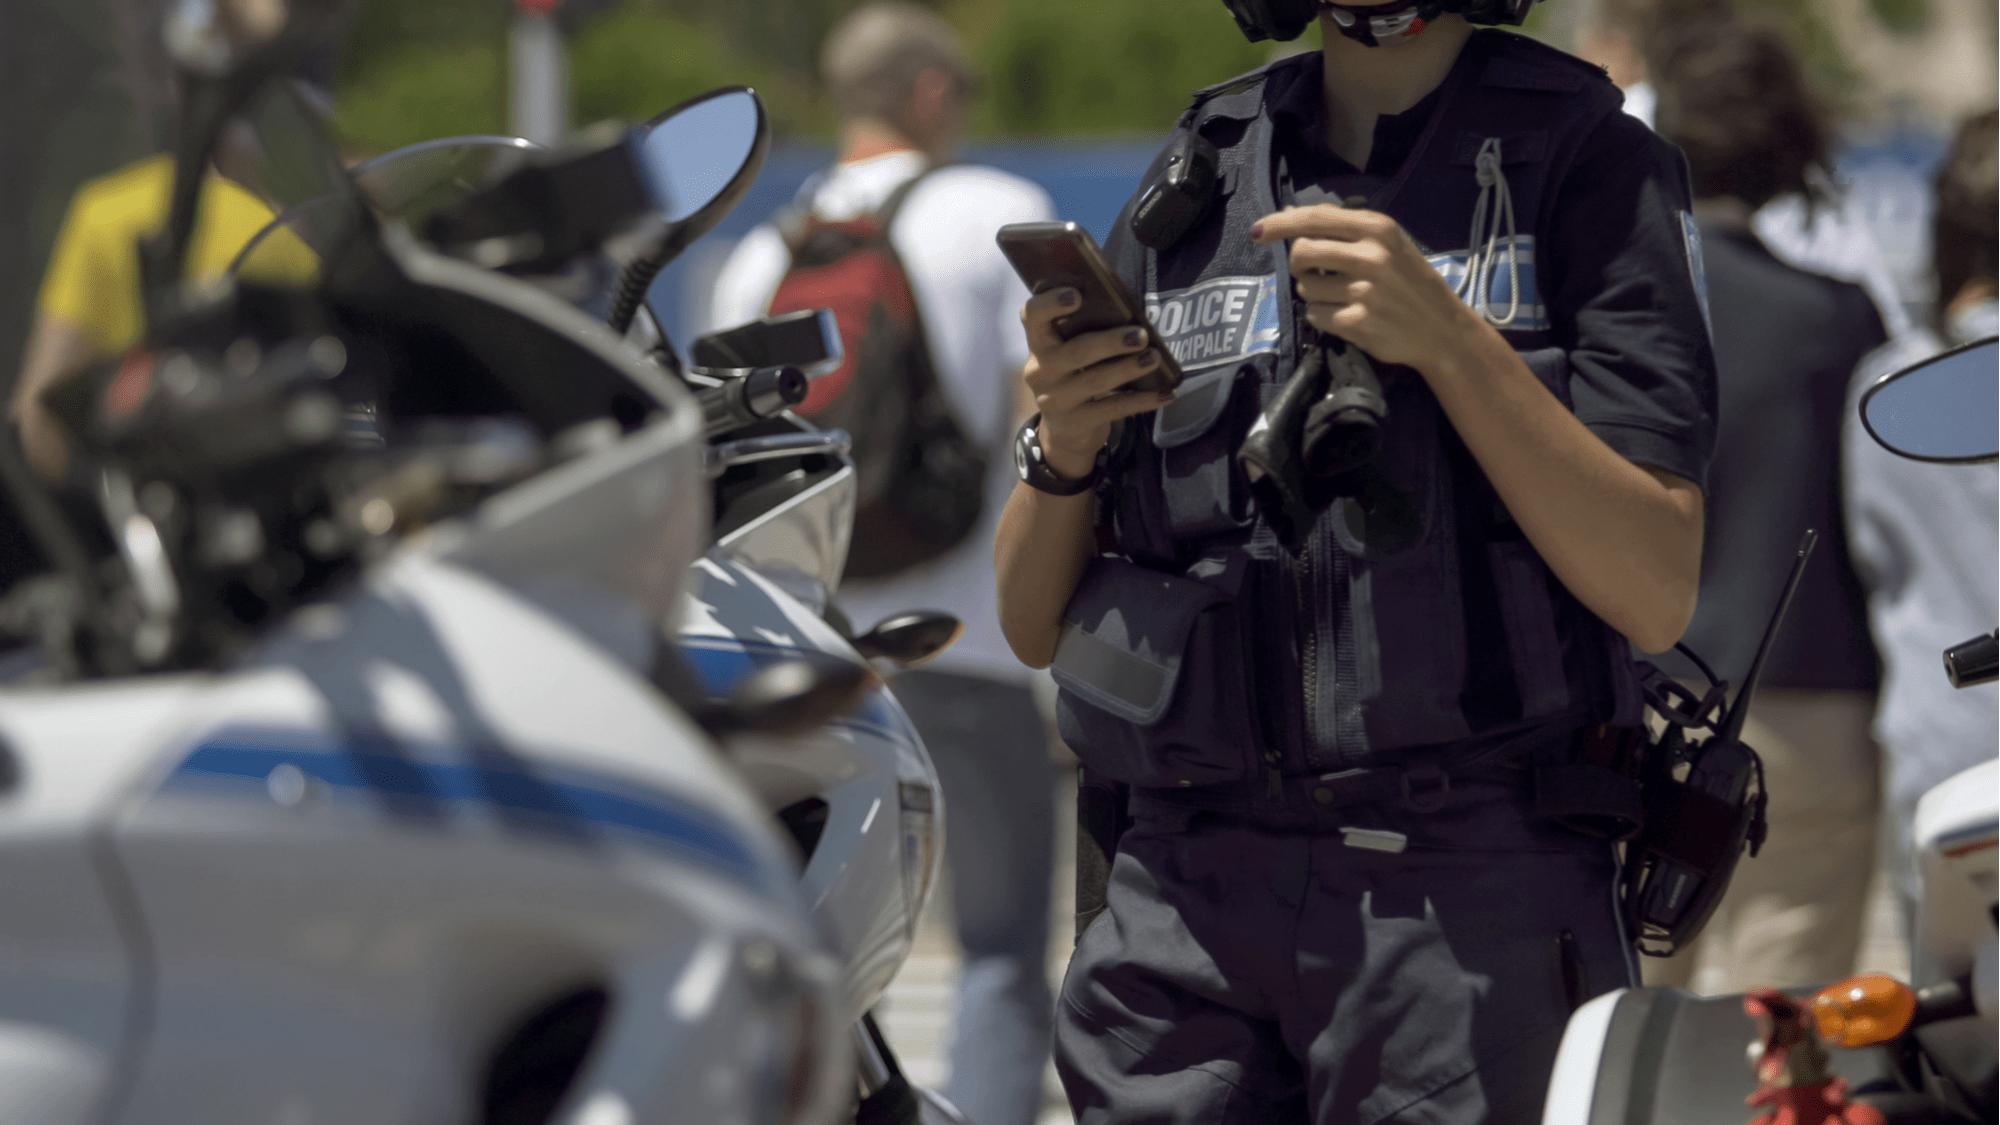 5G-public safety